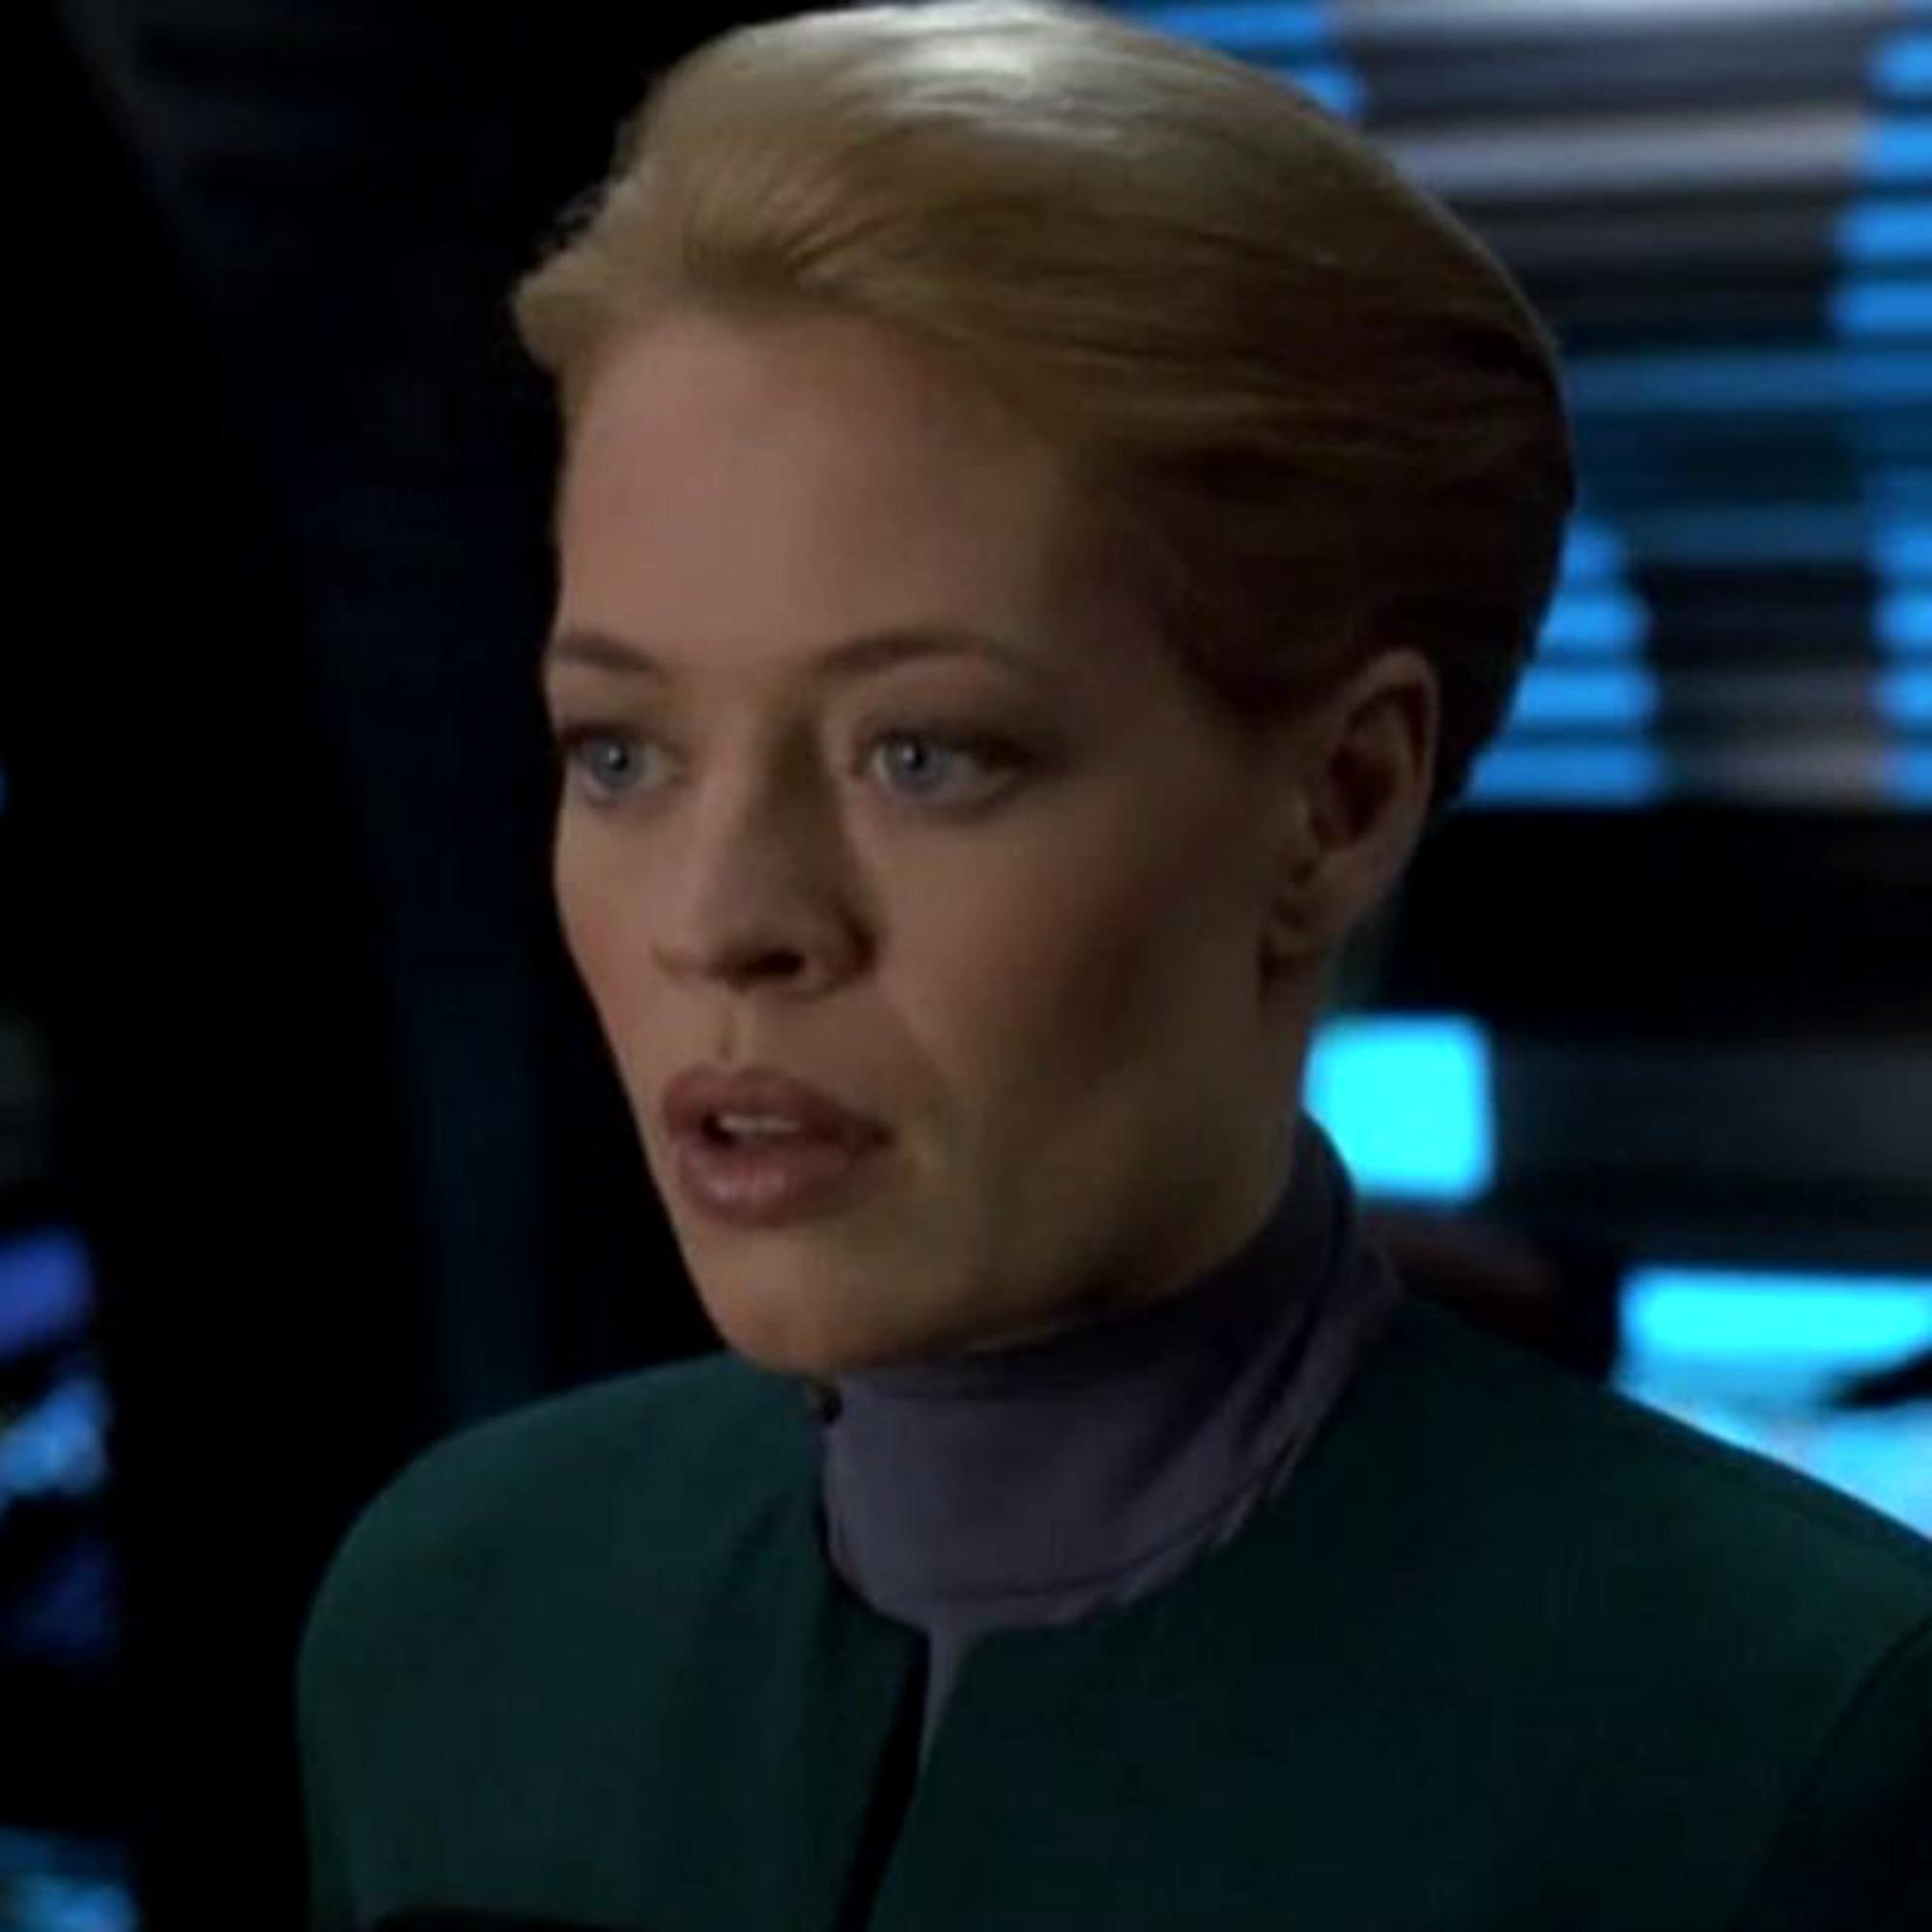 Lieutenant Annika Hansen